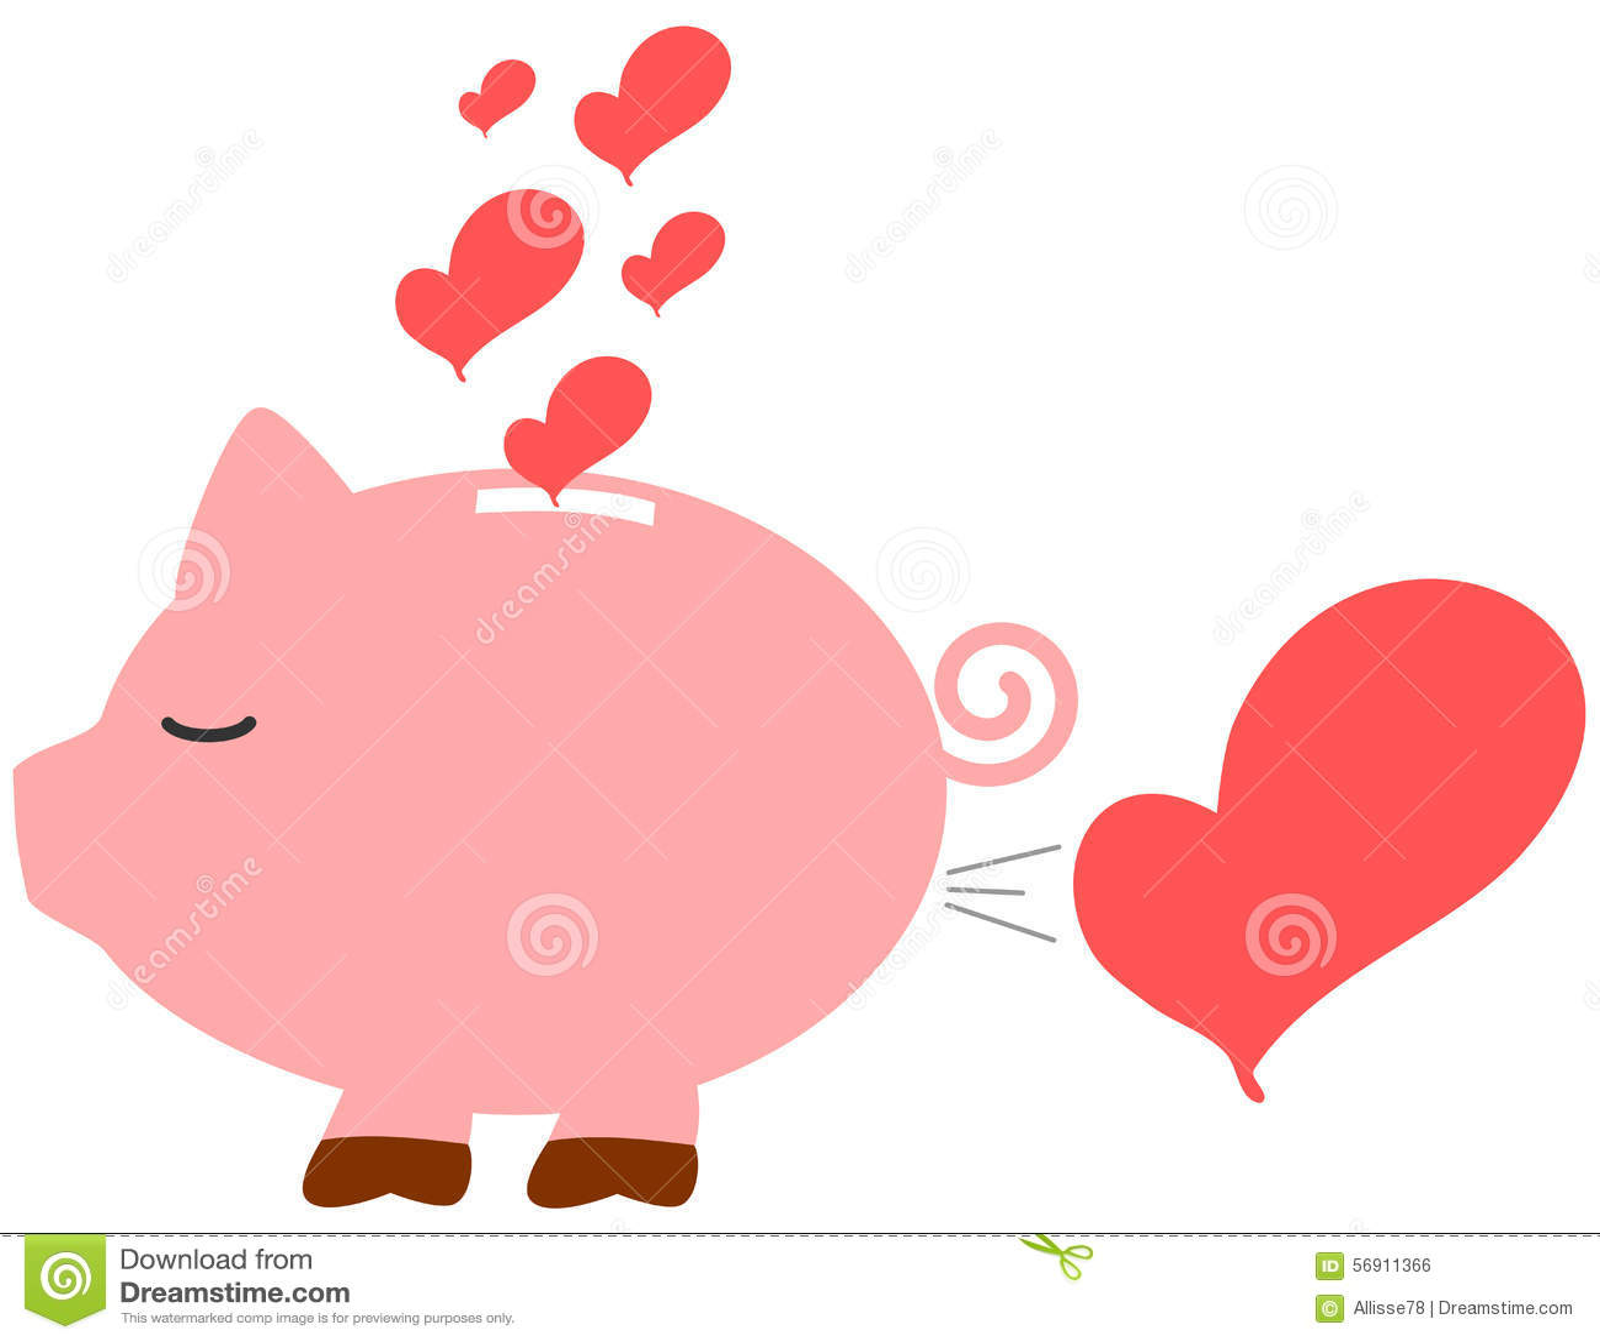 Cartoon Piggy Love Bank Romantic Concept Illustration